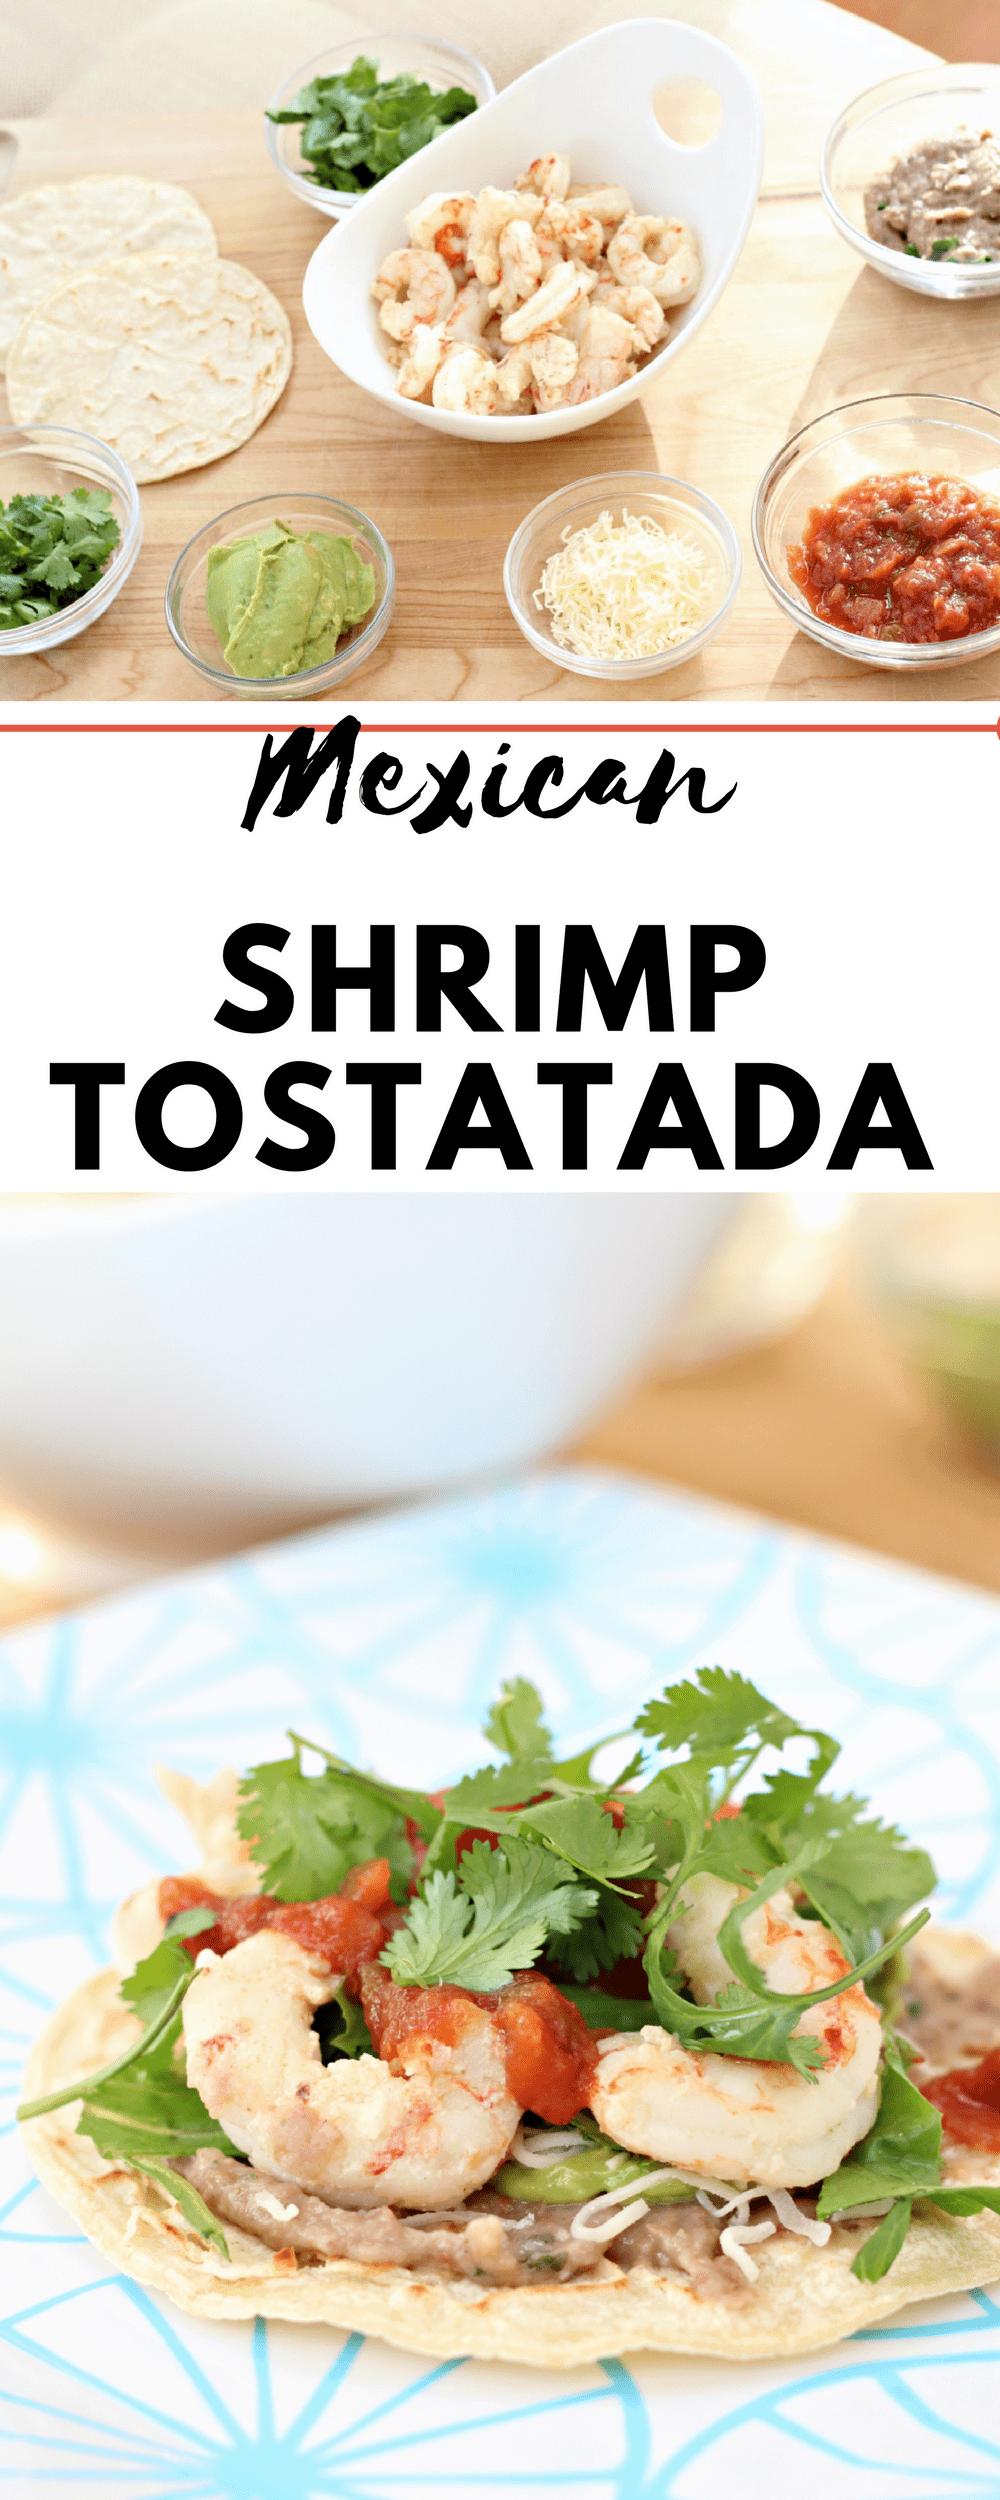 Gluten free shrimp tostada